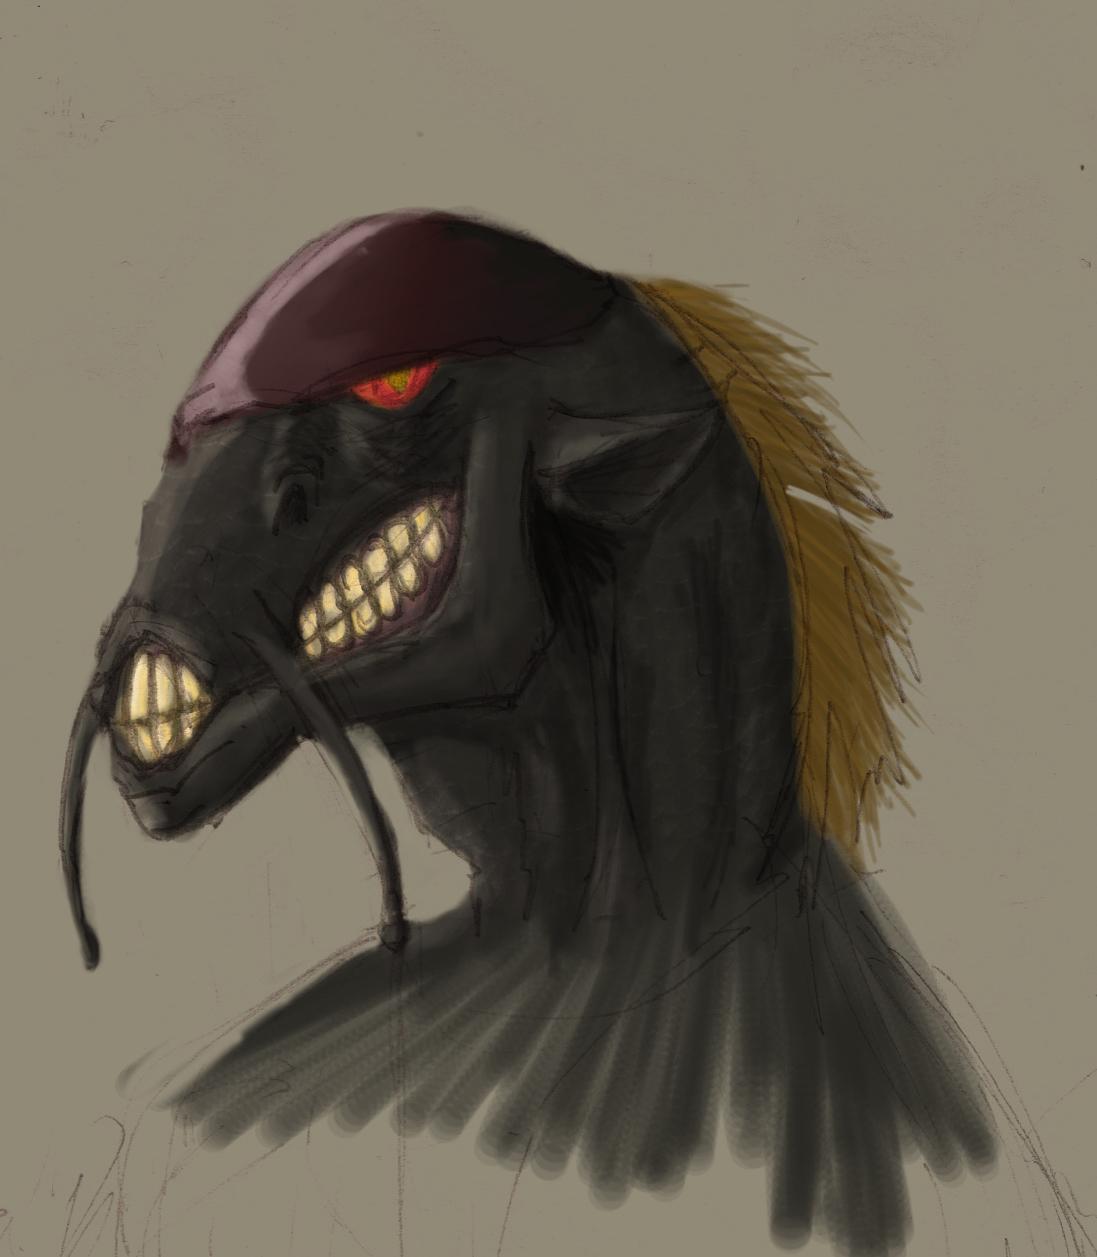 Original Concept Art For Alien Original Concept Art